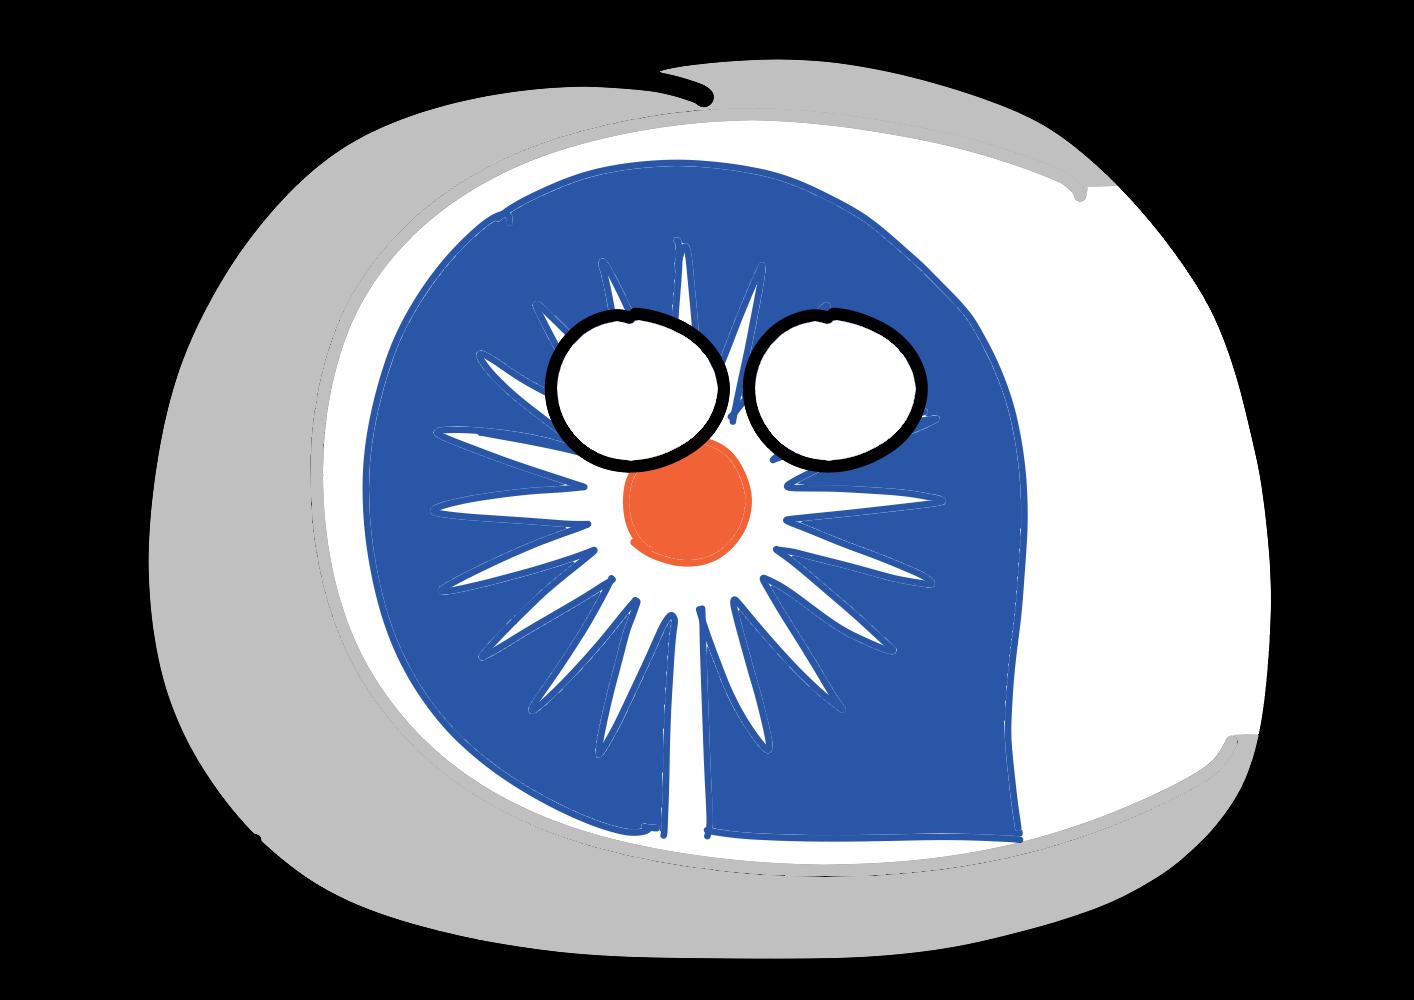 Antalyaball